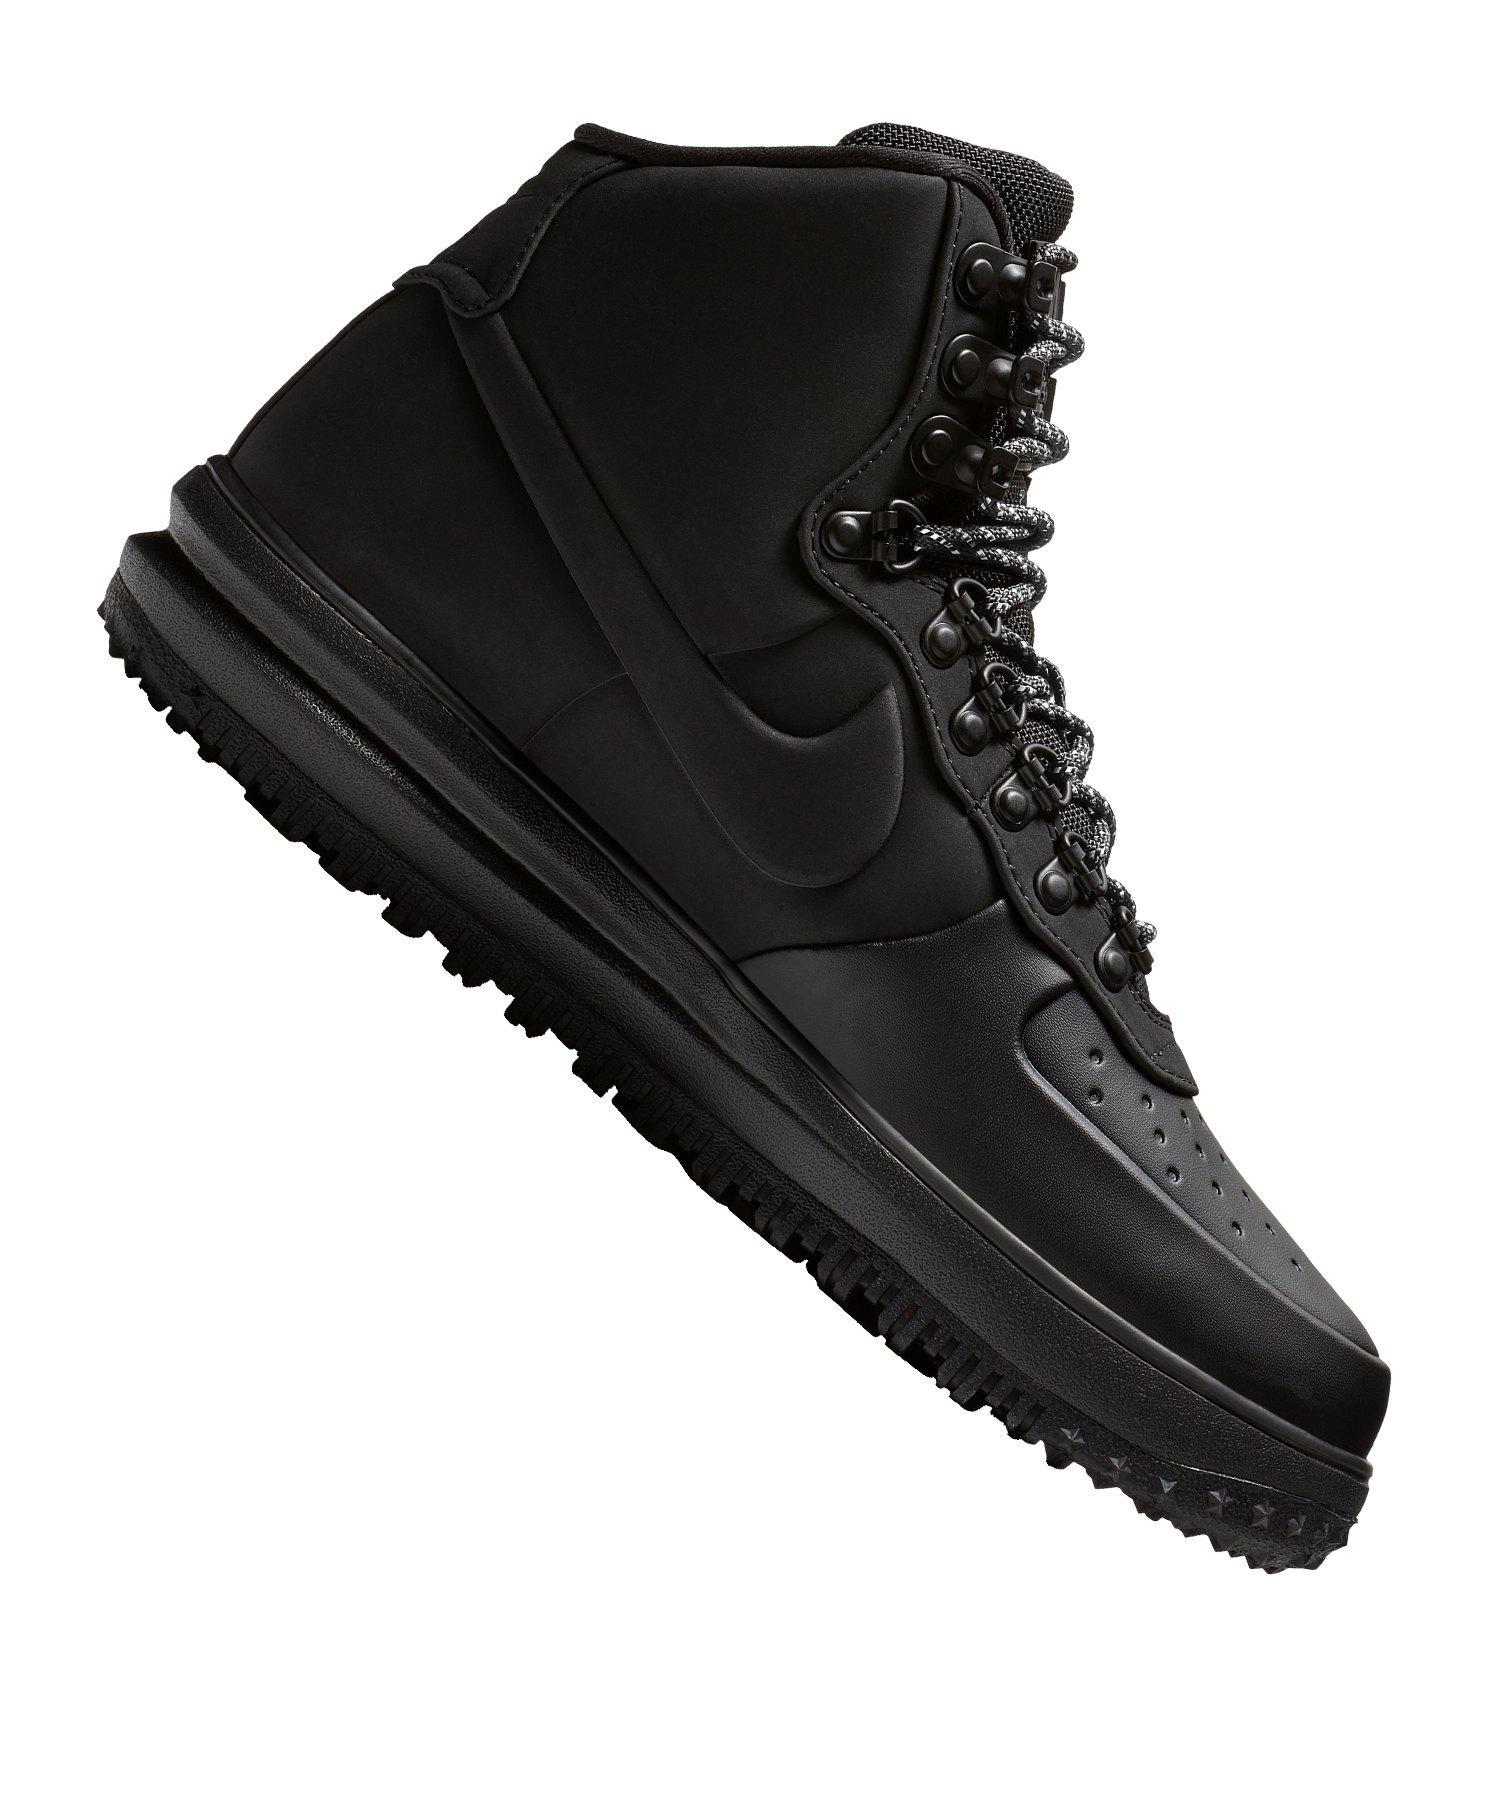 Schuhe Nike LUNAR FORCE 1 DUCKBOOT 18